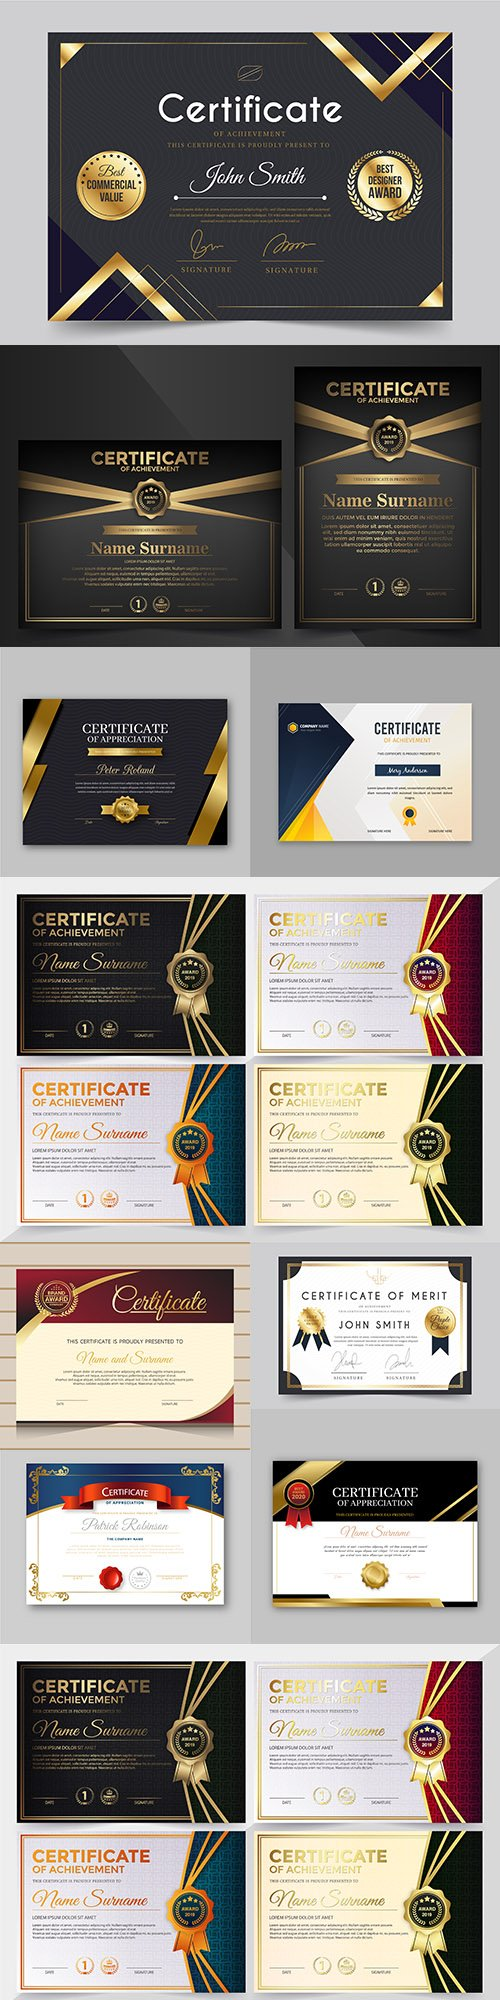 Certificate achievement template design collection